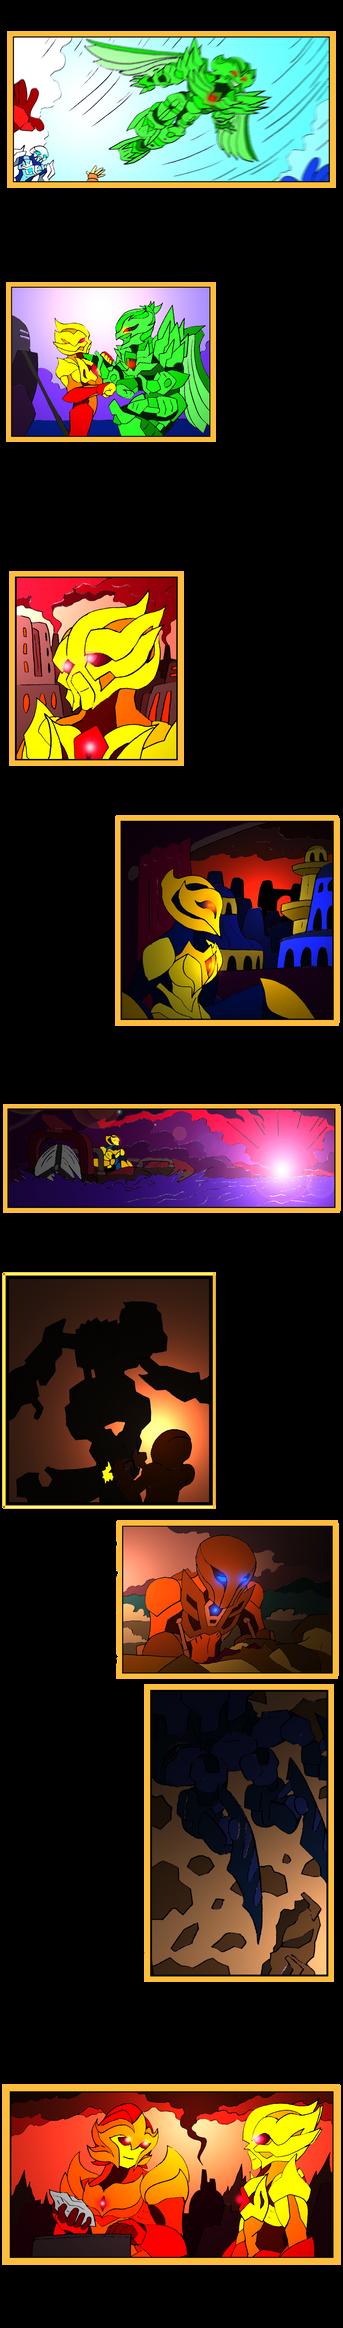 Bionicle- Nova Orbis- Mystery- Chapter 3